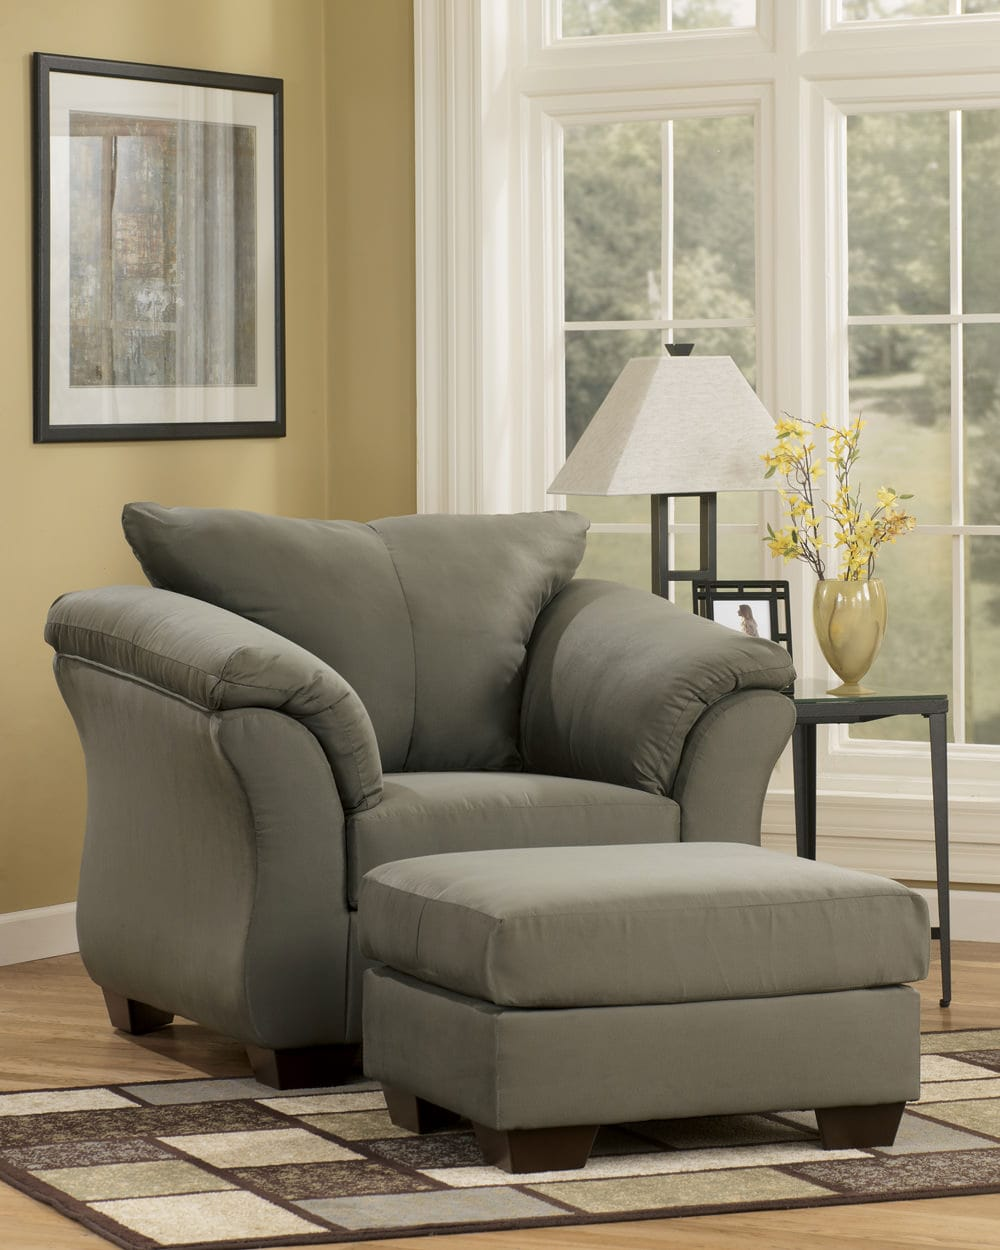 Ashley Furniture: Darcy Sage Ottoman Signature Design By Ashley Furniture